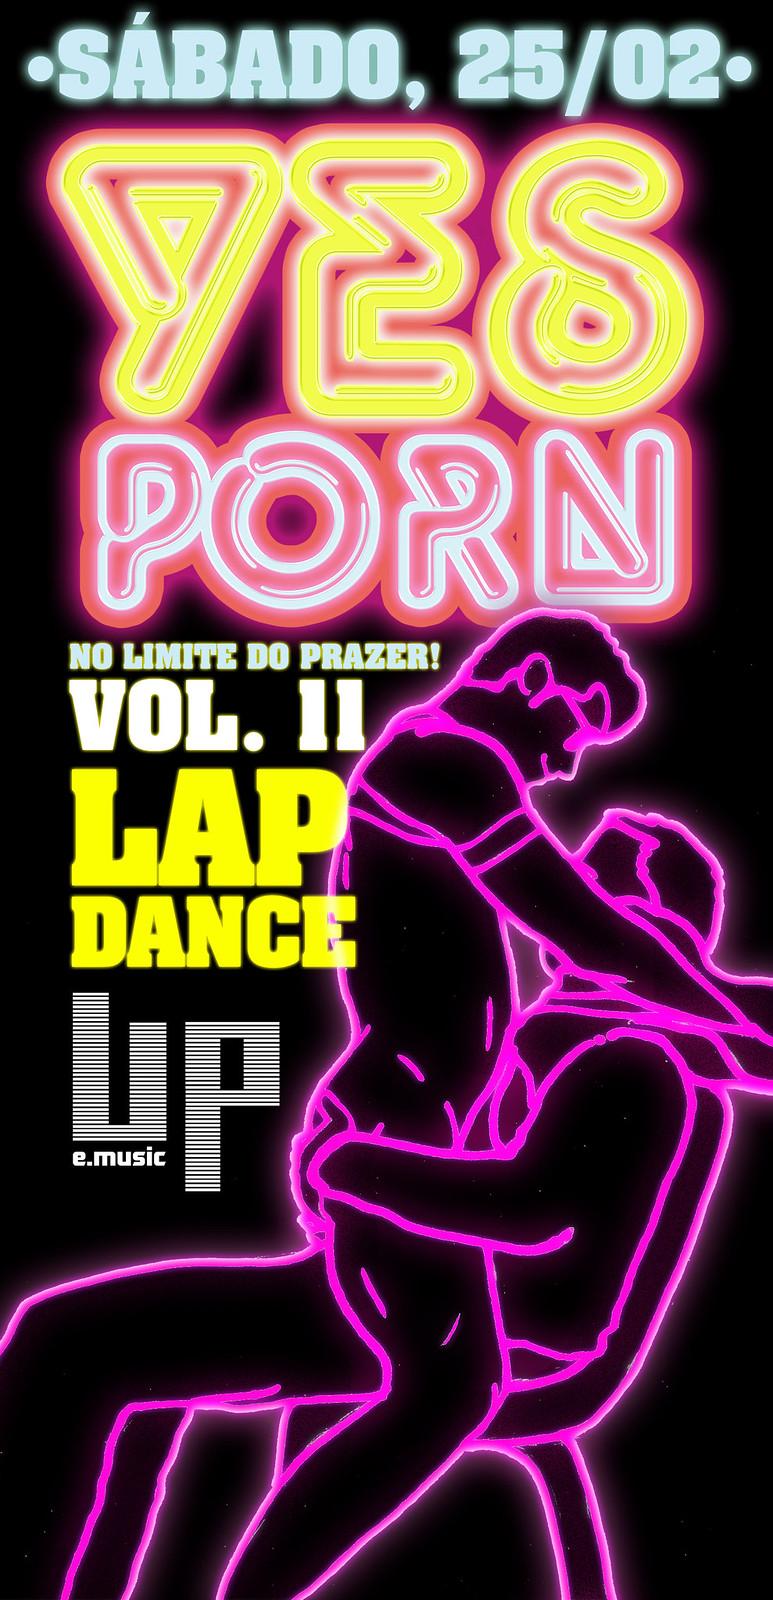 Yes Porn Vol. 11 - Lap Dance 25/02 | Flickr